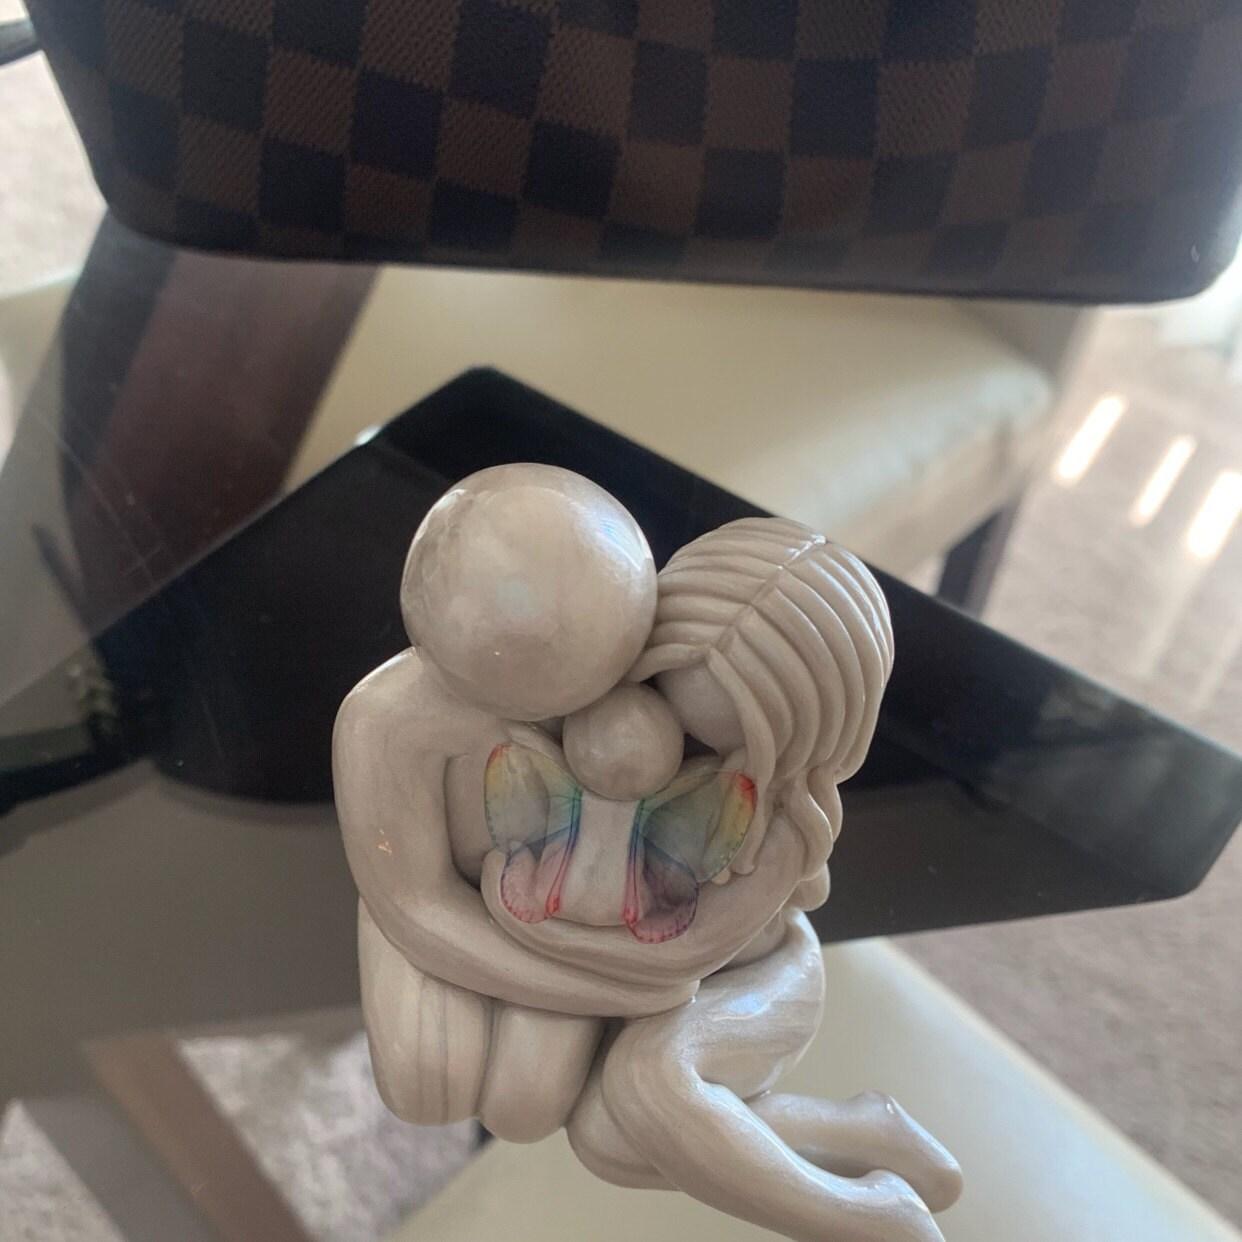 GabriellaMcFerran added a photo of their purchase